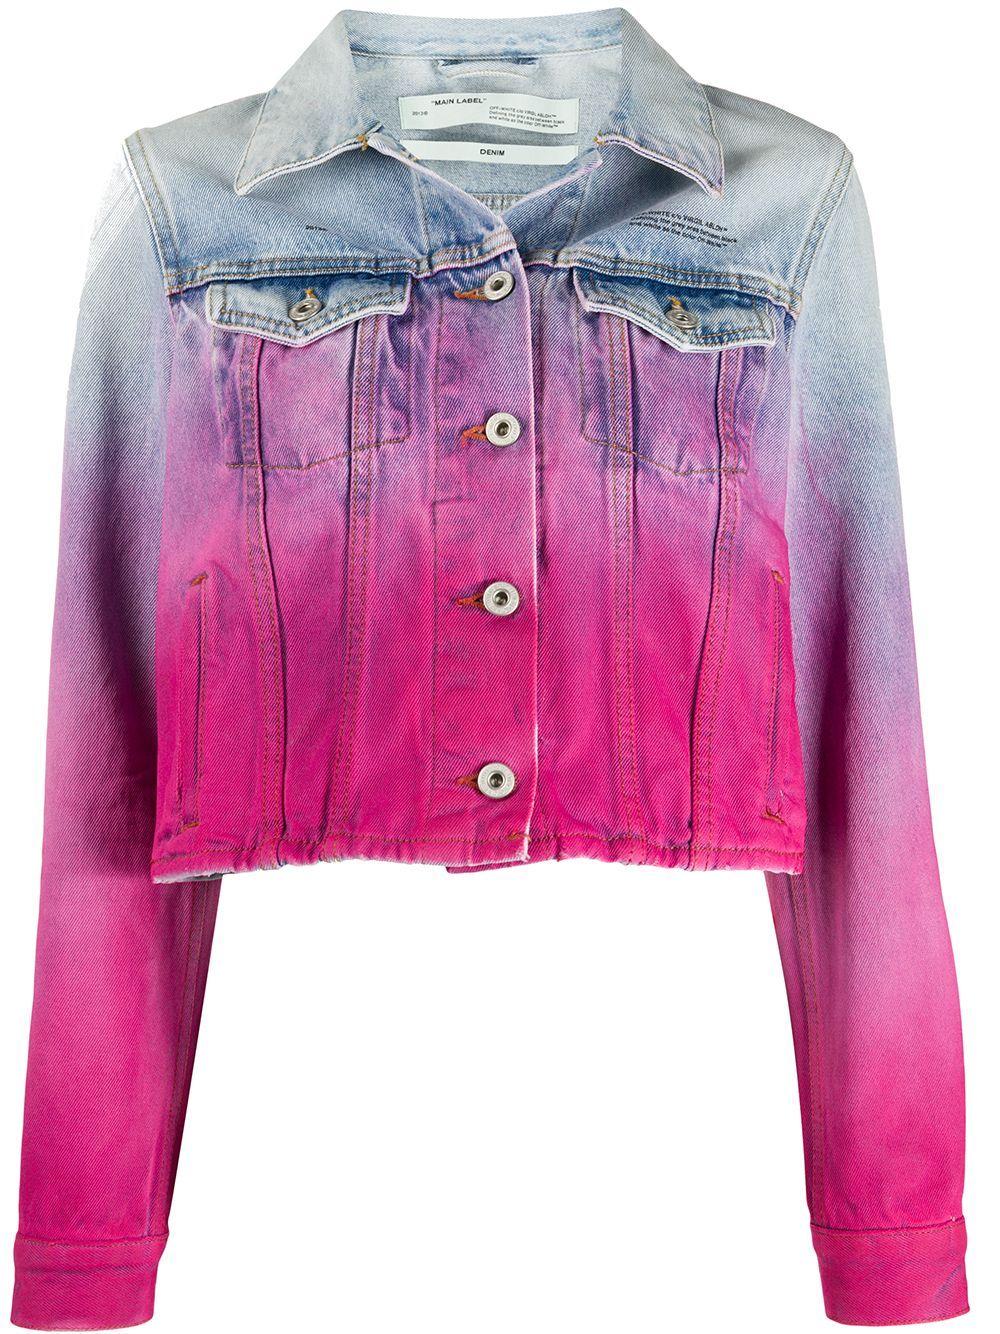 Off White Spray Paint Effect Denim Jacket Farfetch Embellished Denim Jacket Pink Denim Jacket White Denim Jacket [ 1334 x 1000 Pixel ]